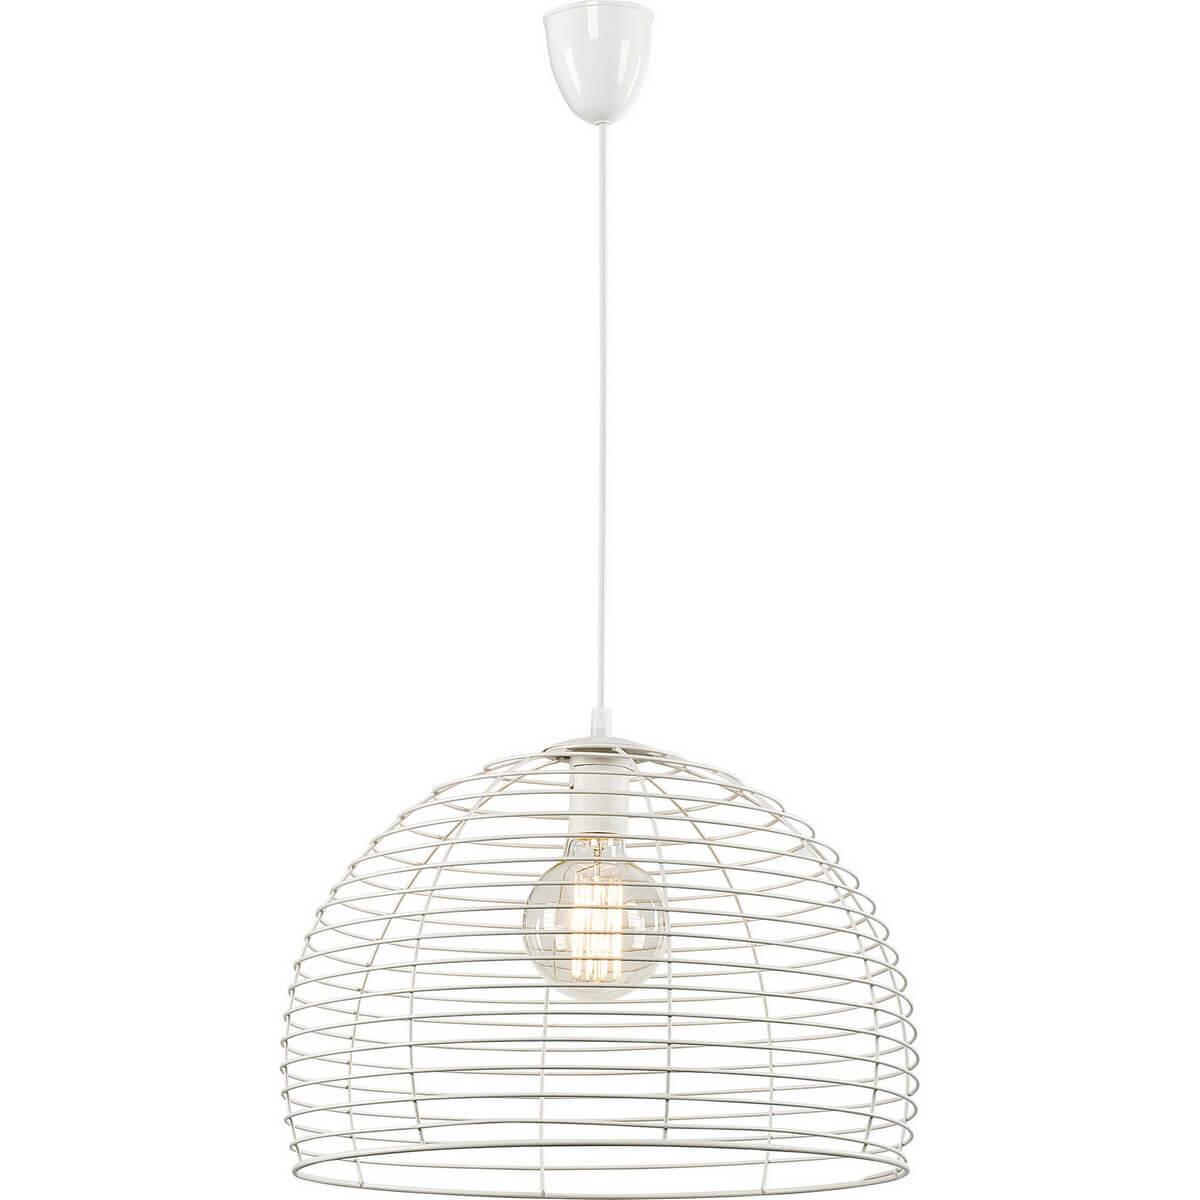 Подвесной светильник Nowodvorski Perth 5491 nowodvorski perth white i zwis